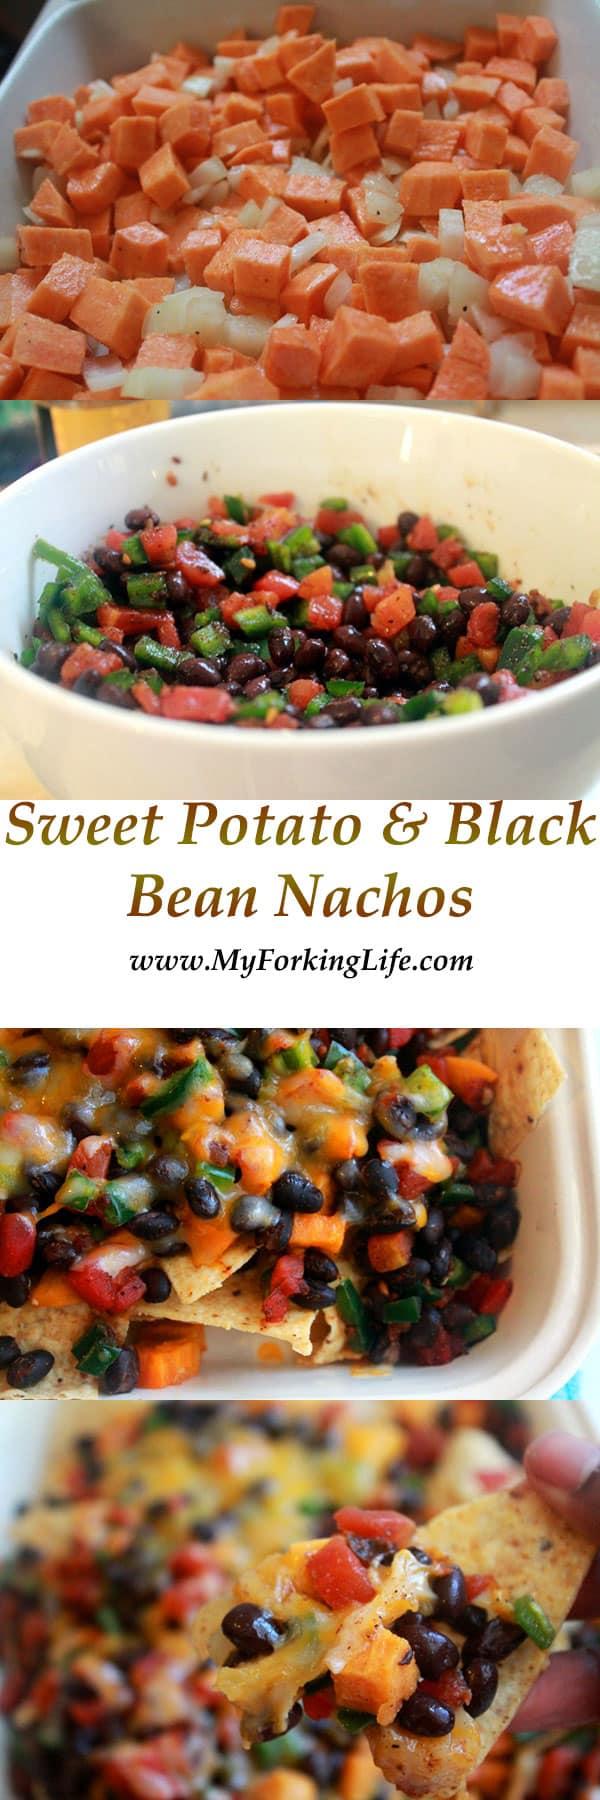 sweet potato & black bean nachos. # vegetarian. #meatlessmeals www.myforkinglife.com